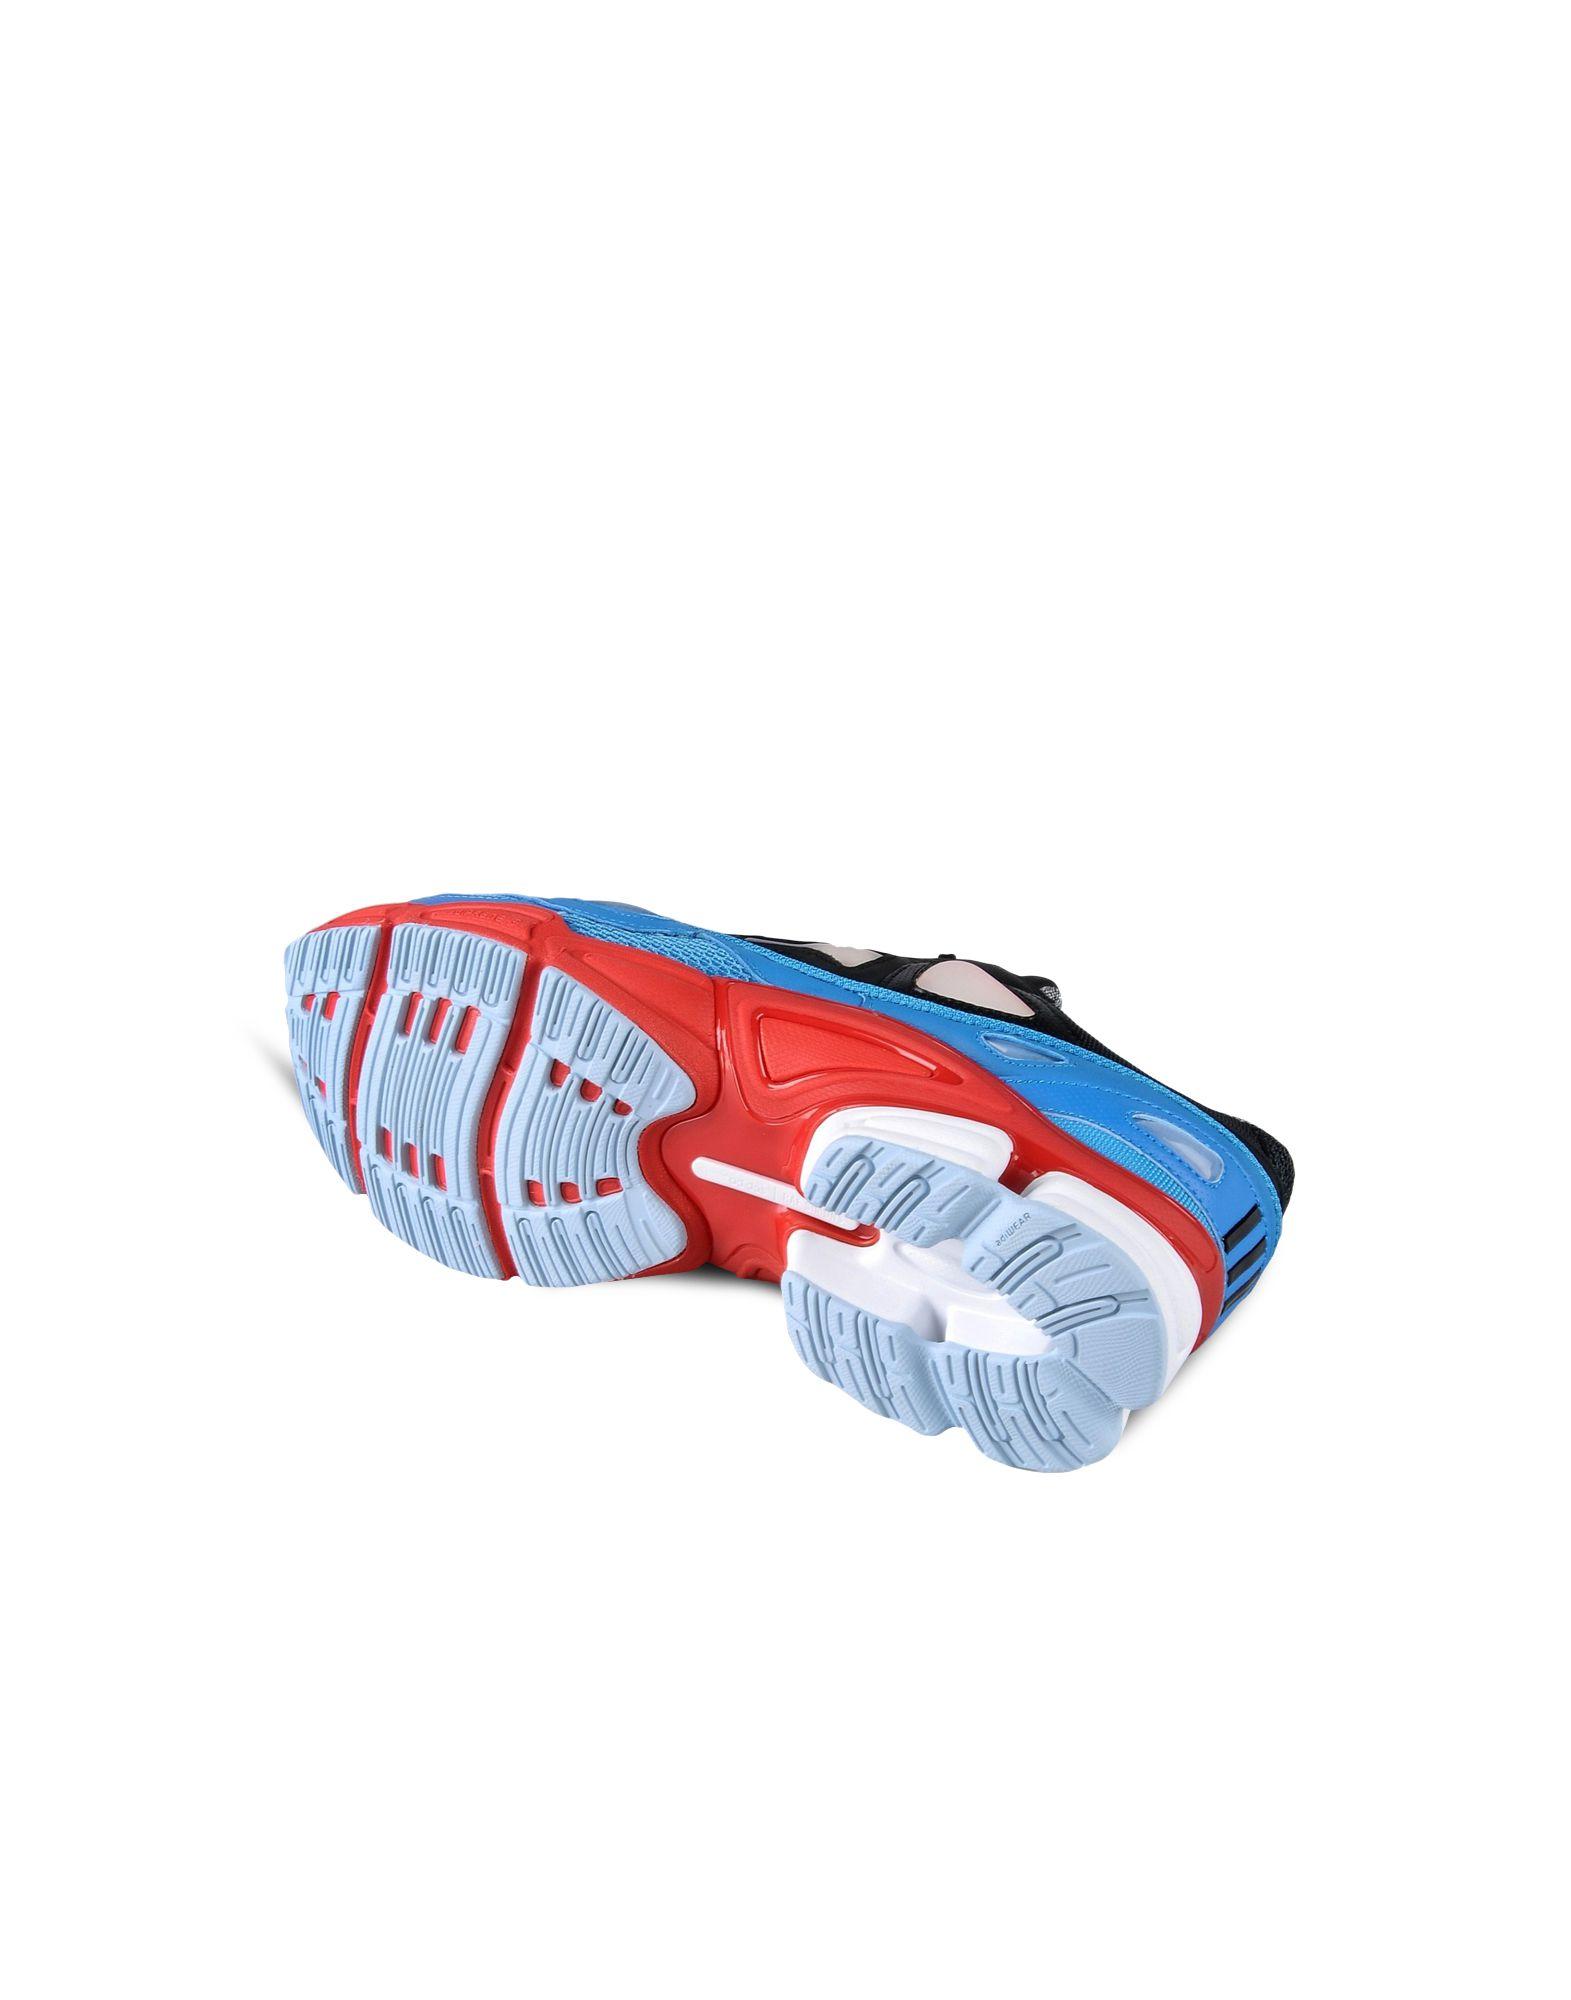 sneakers adidas by raf simons ozweego 2 f r sie y 3. Black Bedroom Furniture Sets. Home Design Ideas